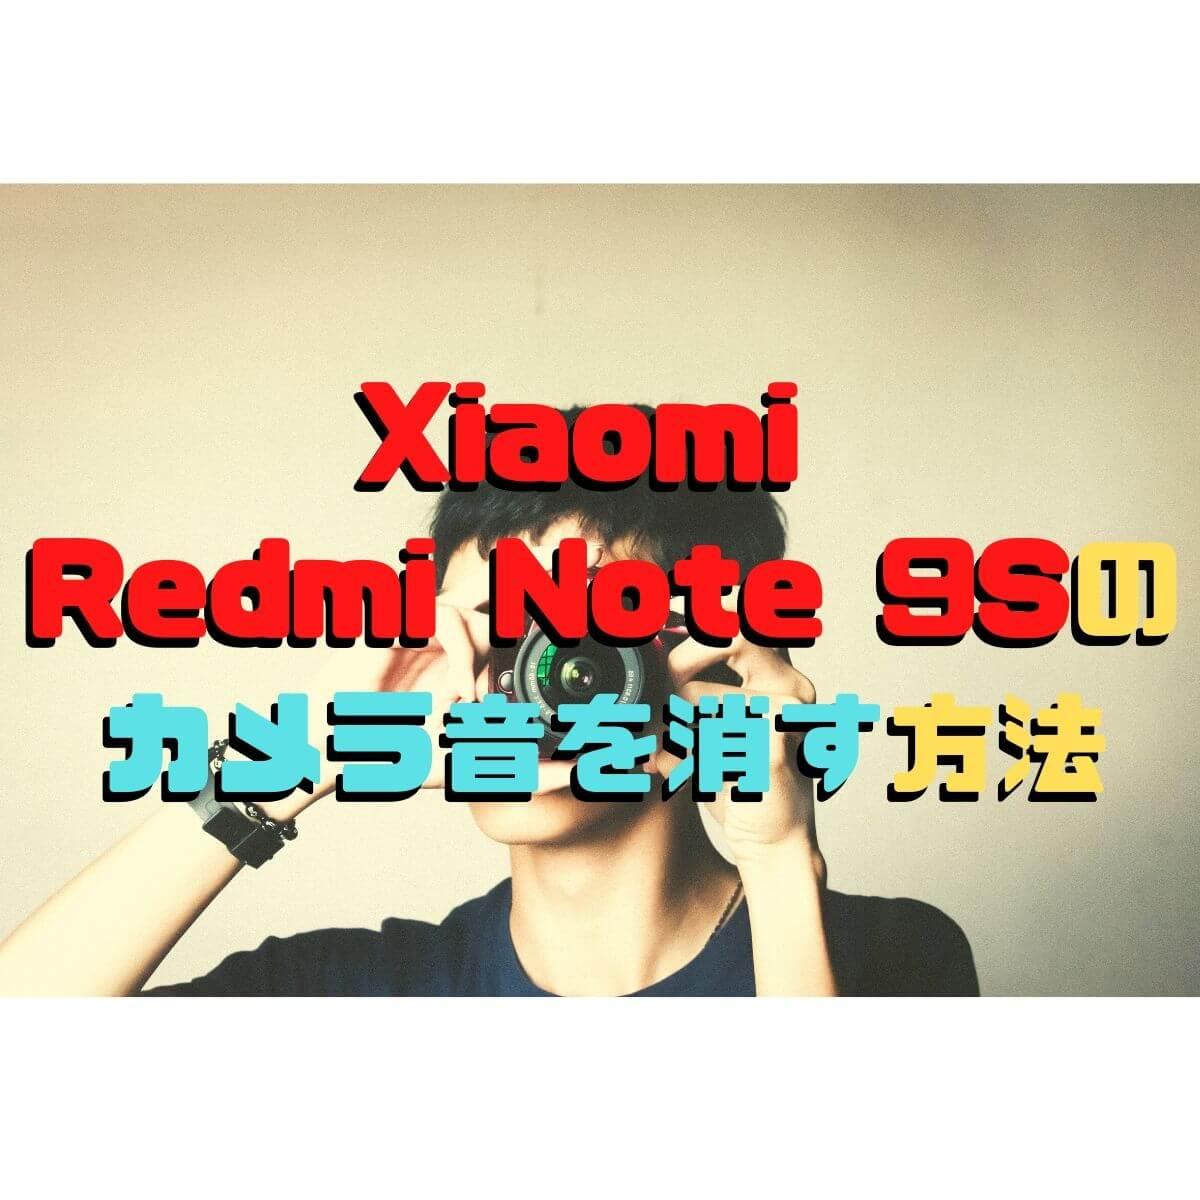 Xiaomi Redmi Note 9Sのカメラシャッター音を消す方法